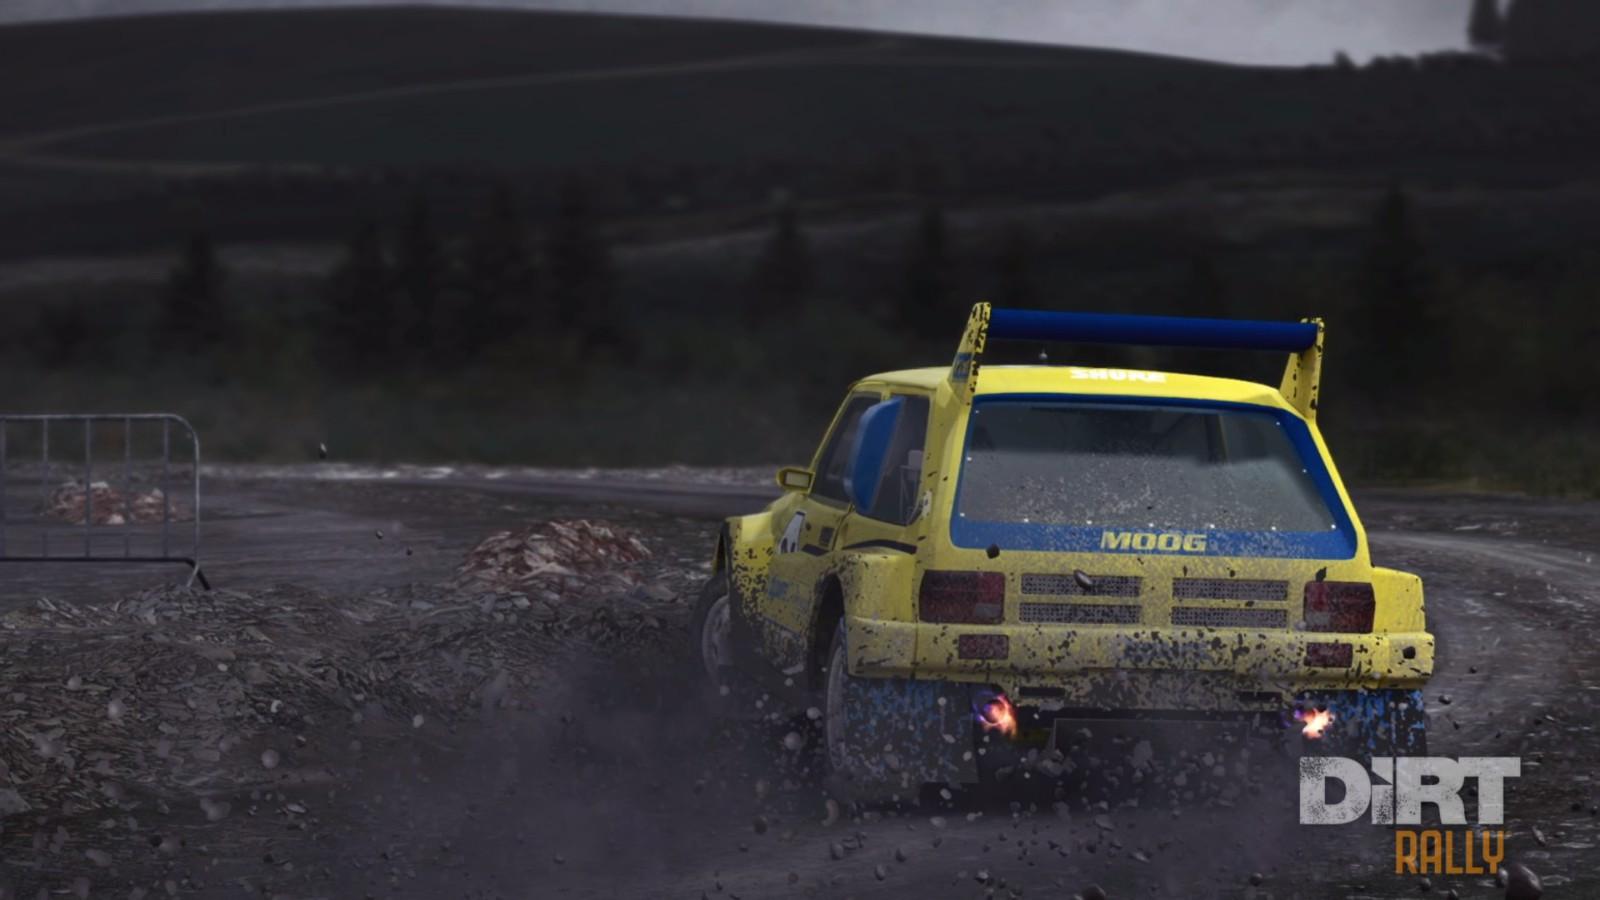 20180415085606_1.jpg - DiRT Rally